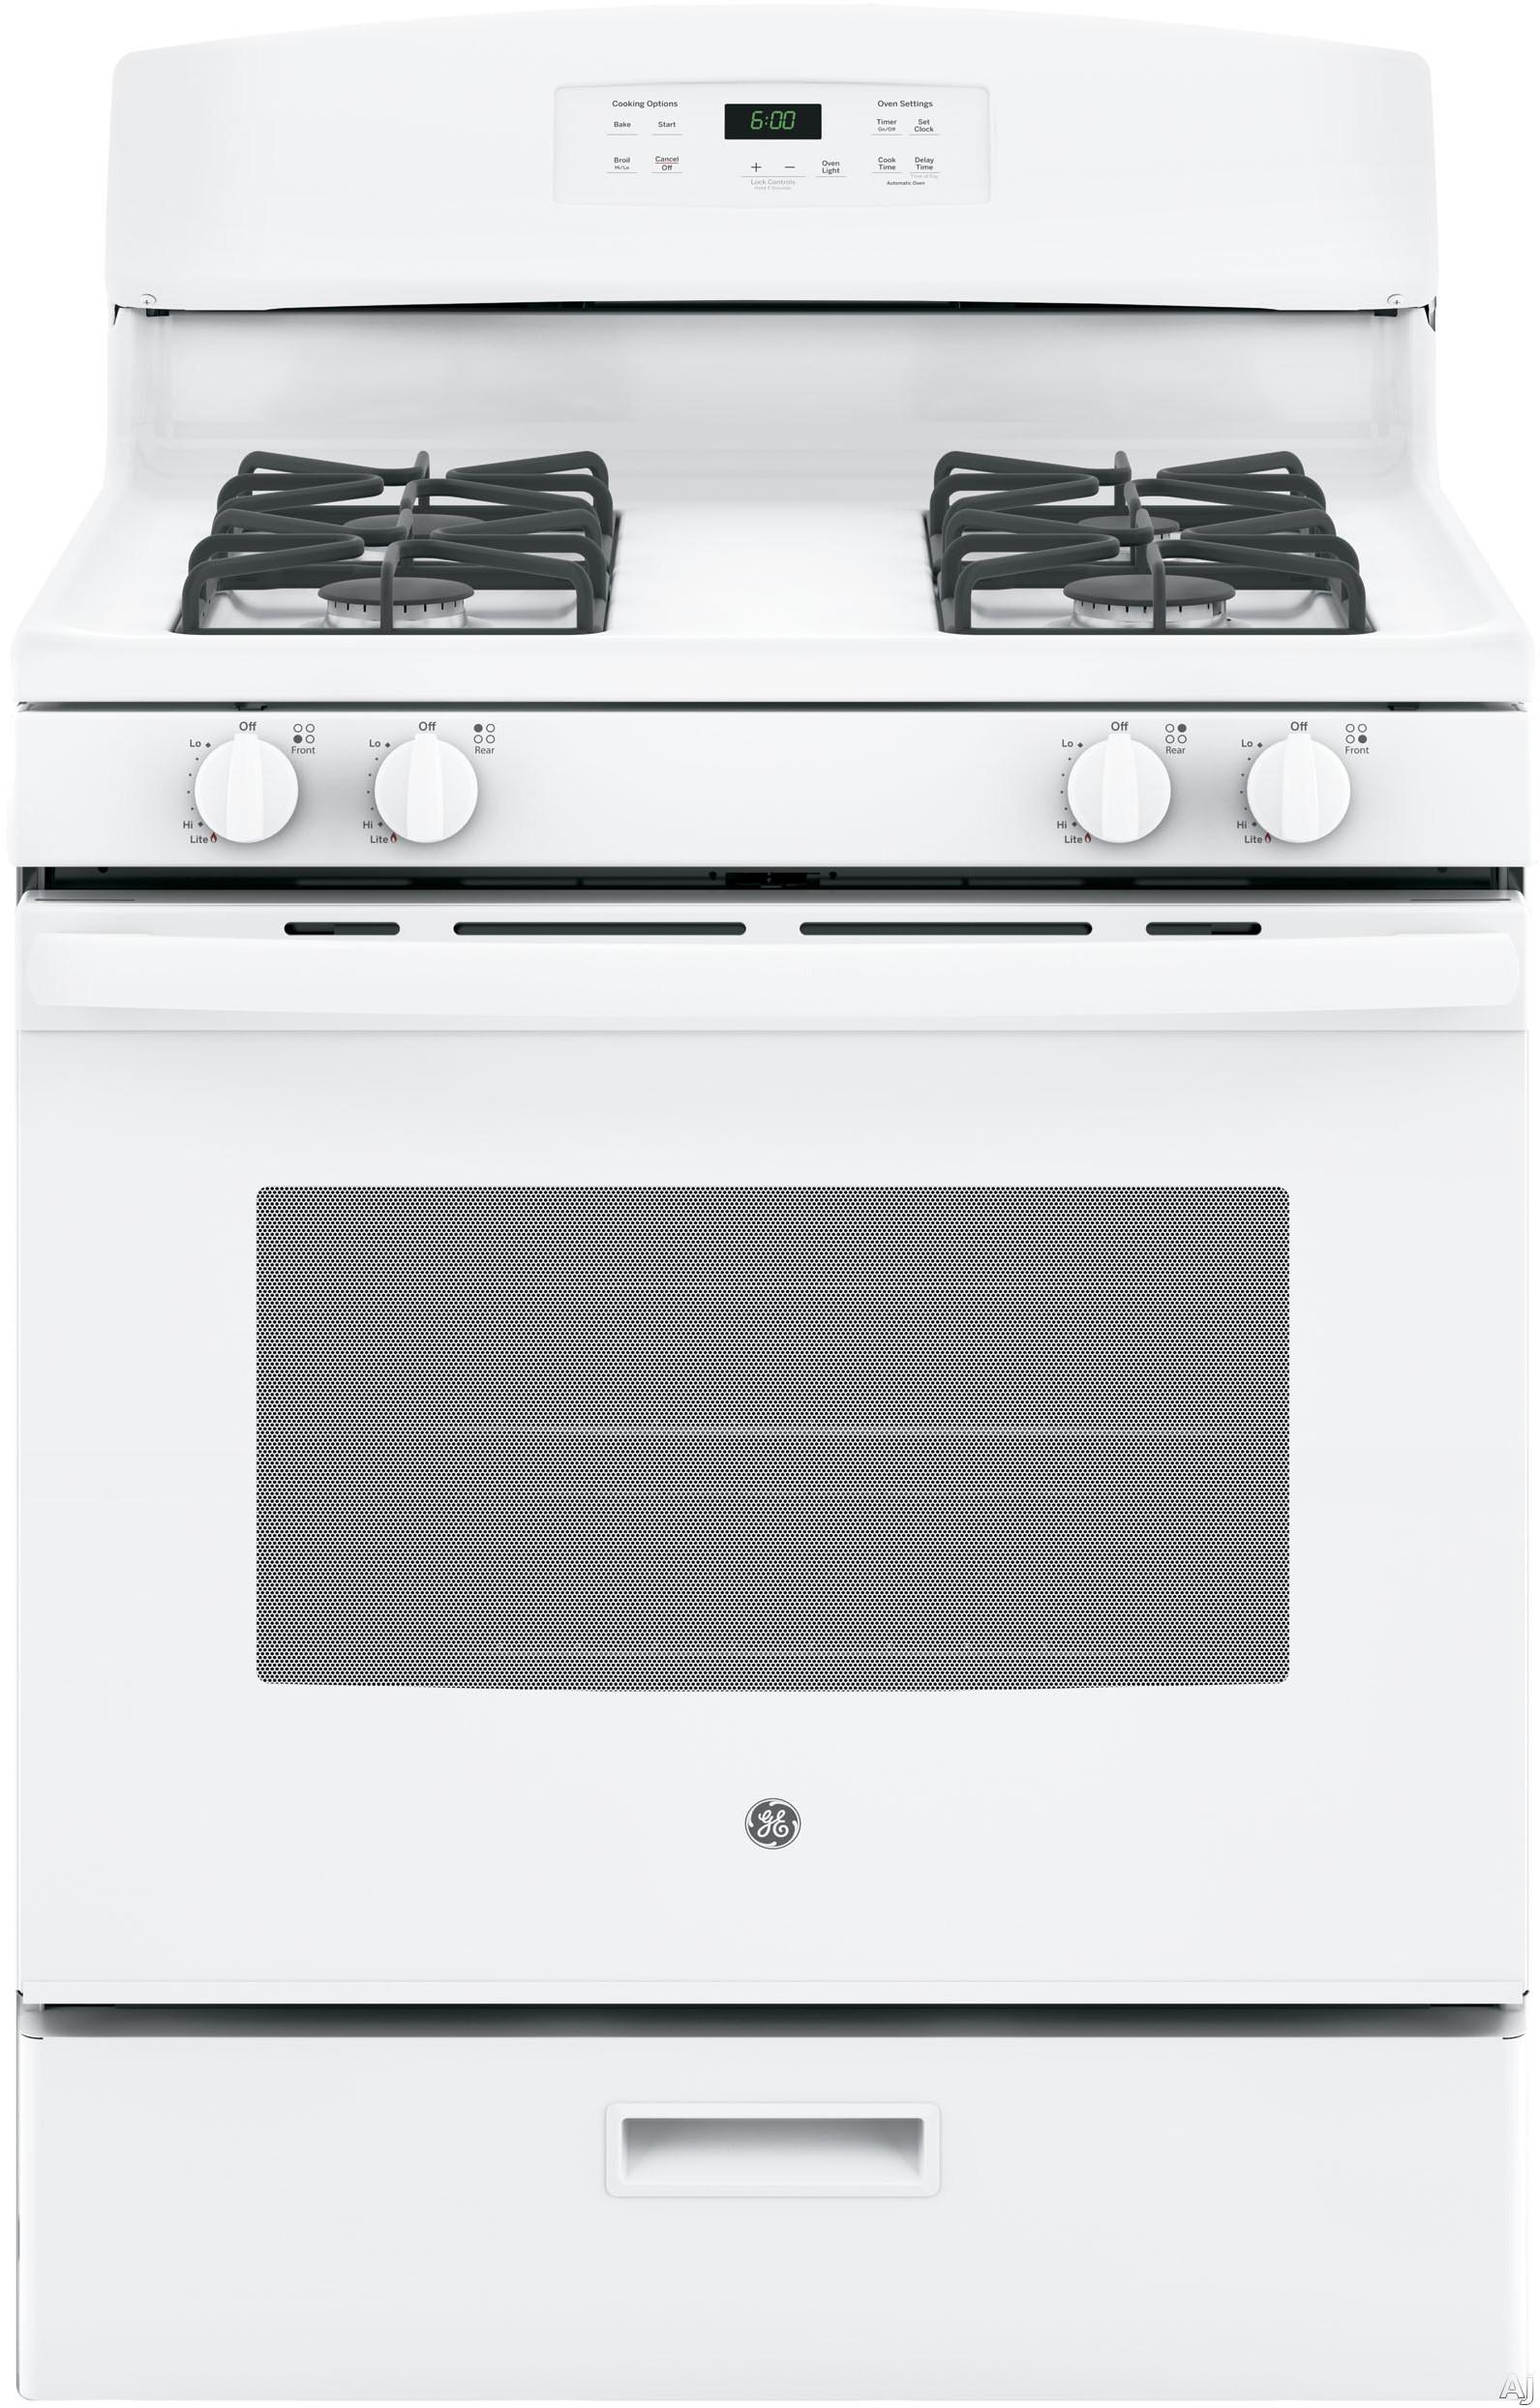 GE JGBS60DEKWW 30 Inch Freestanding Gas Range with Precise Simmer Burner, Power Burner, Broiler Drawer, 4.8 cu. ft. Capacity, 4 Sealed Burners and Star-K Certified: White